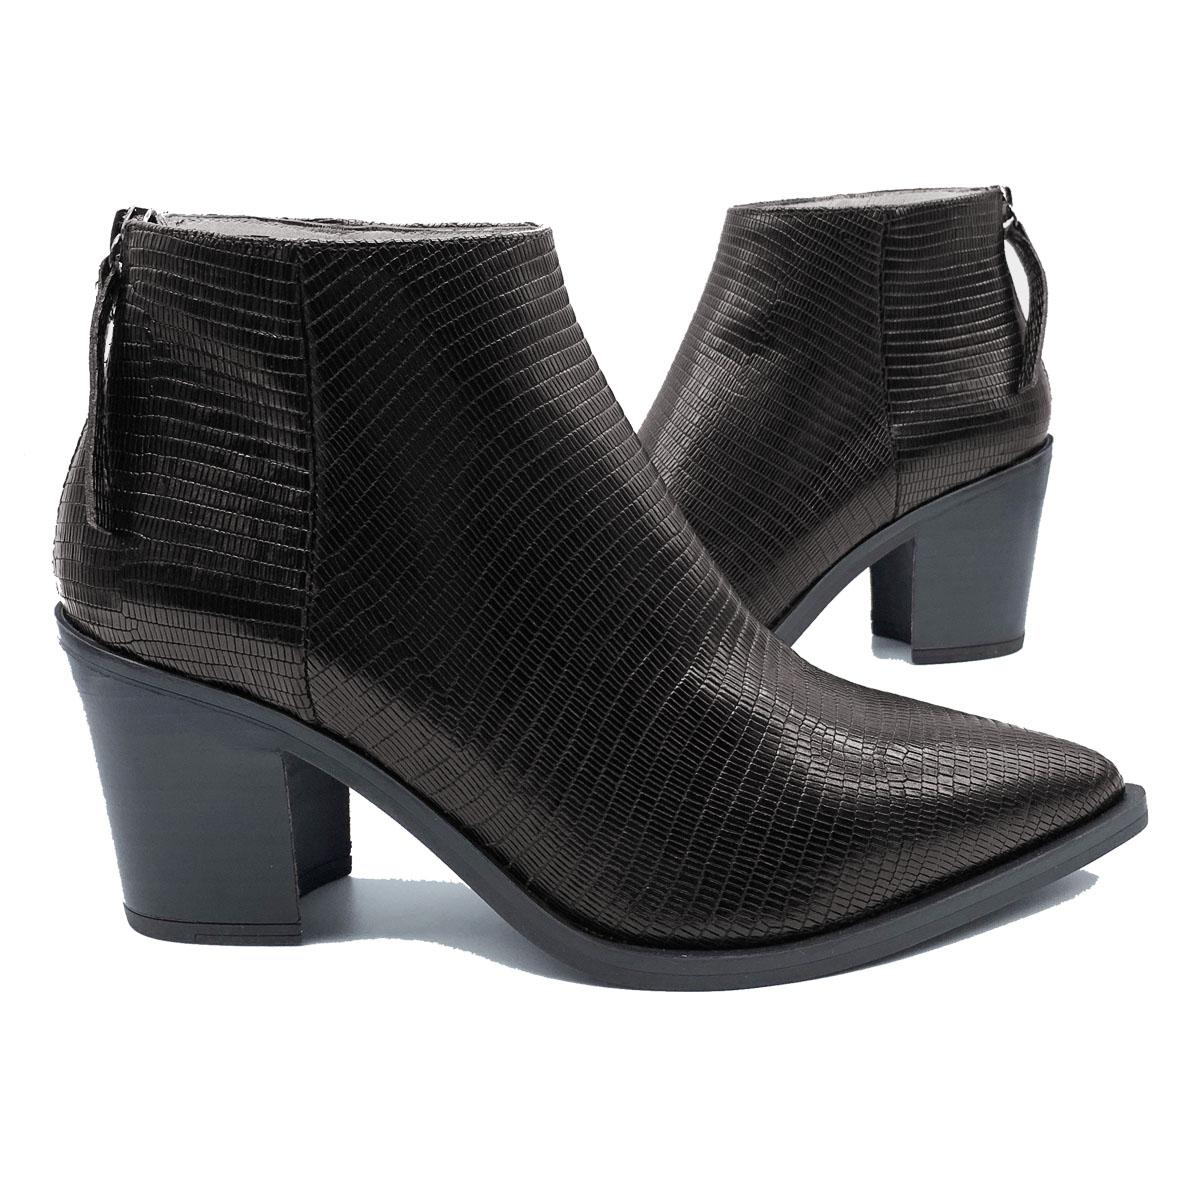 Unisa | Ankle Boots | MIRTEMORO